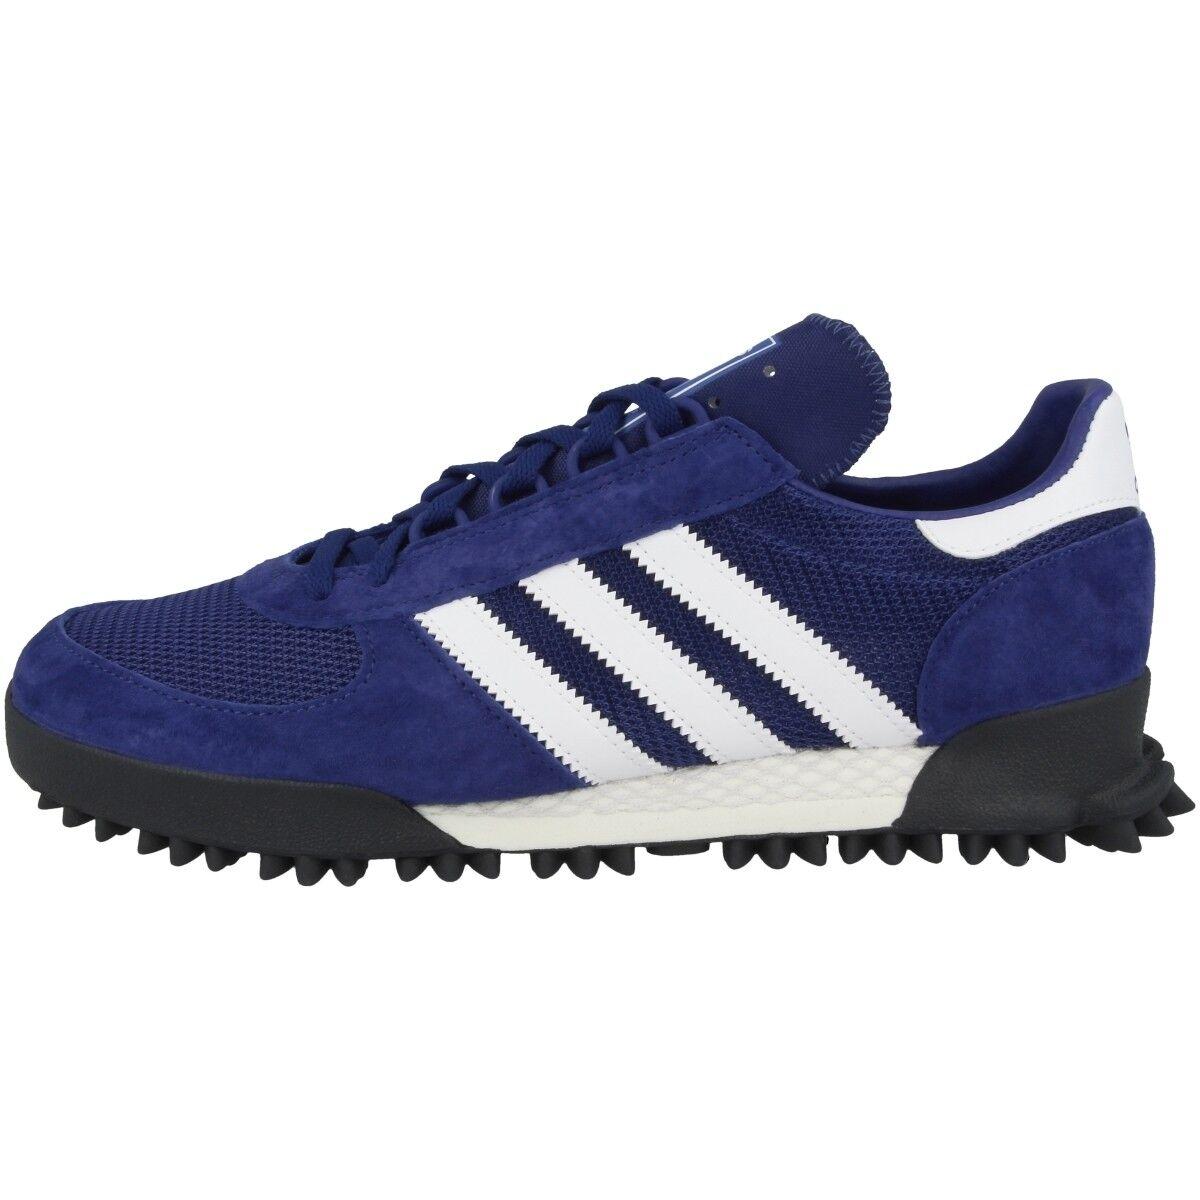 ADIDAS Marathon tr Scarpe Originals scarpe da ginnastica Scarpe Da Corsa Uomo blu bianca b37443